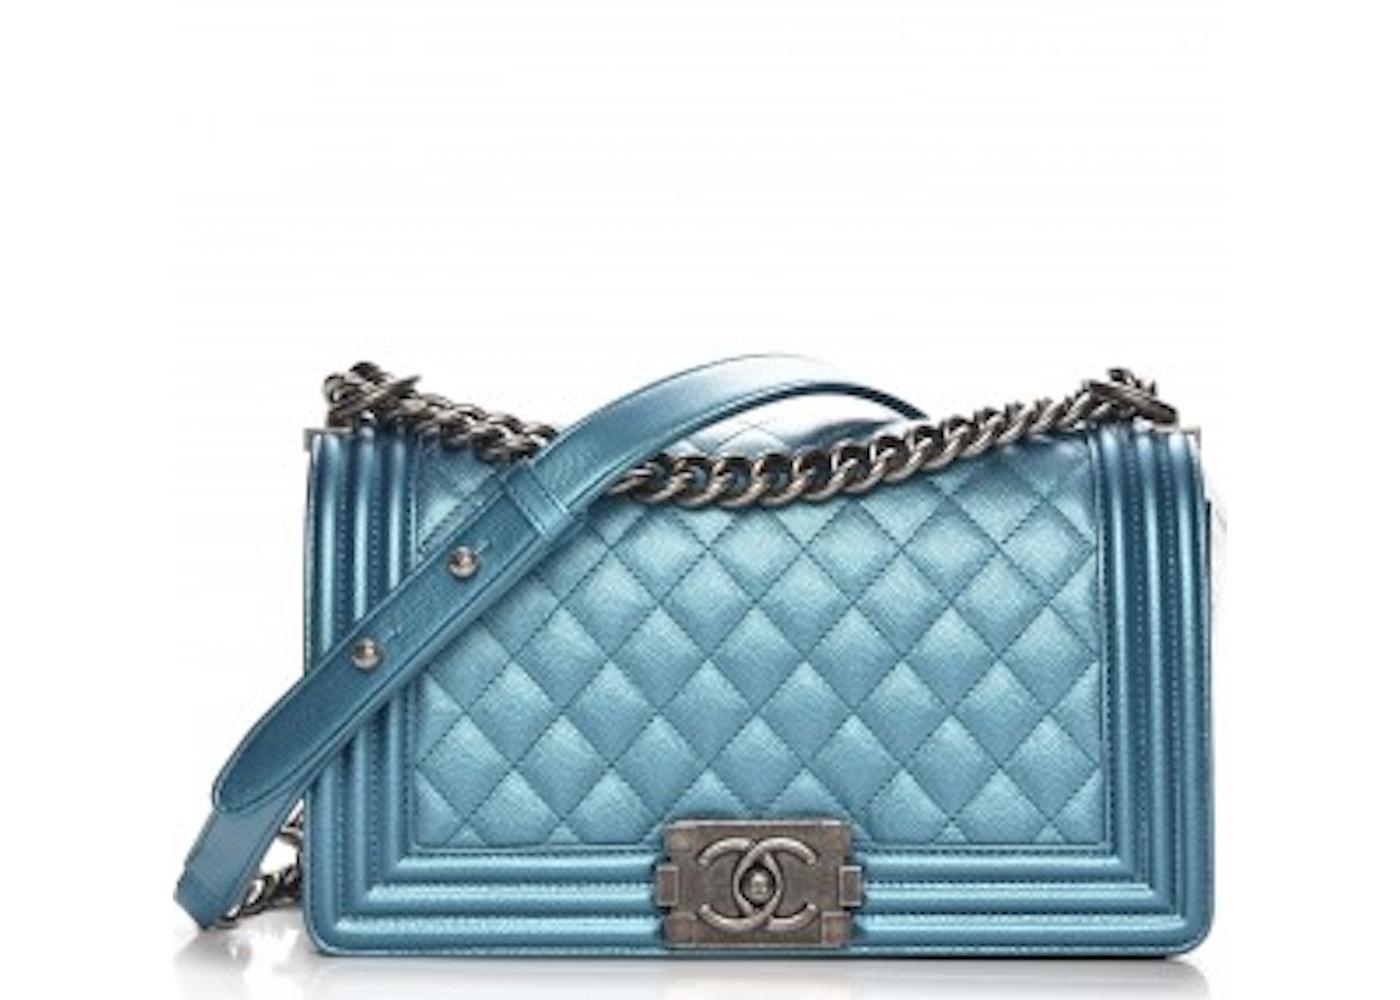 ad882bd905c471 Chanel Boy Flap Diamond Quilted Medium Turquoise. Diamond Quilted Medium  Turquoise